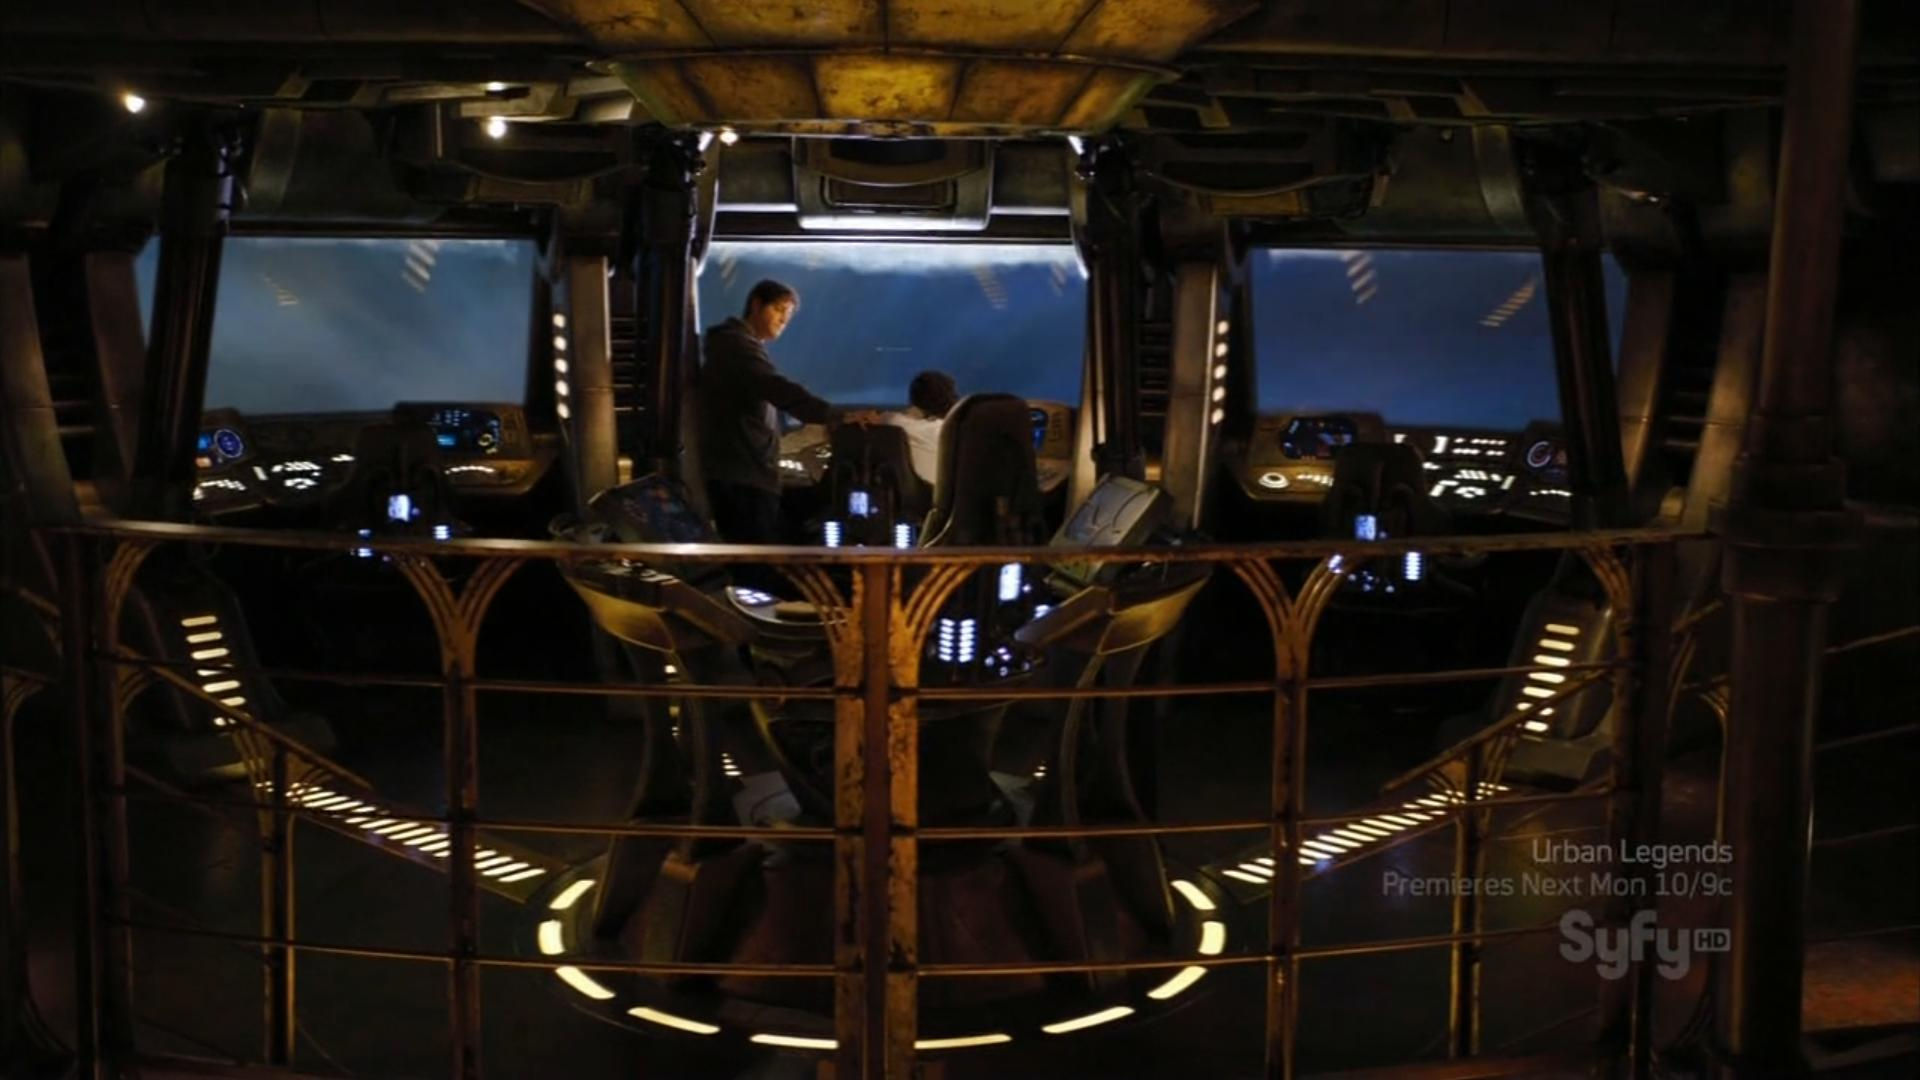 Stargate Universe Destiny Wallpapers Wallpaper Cave